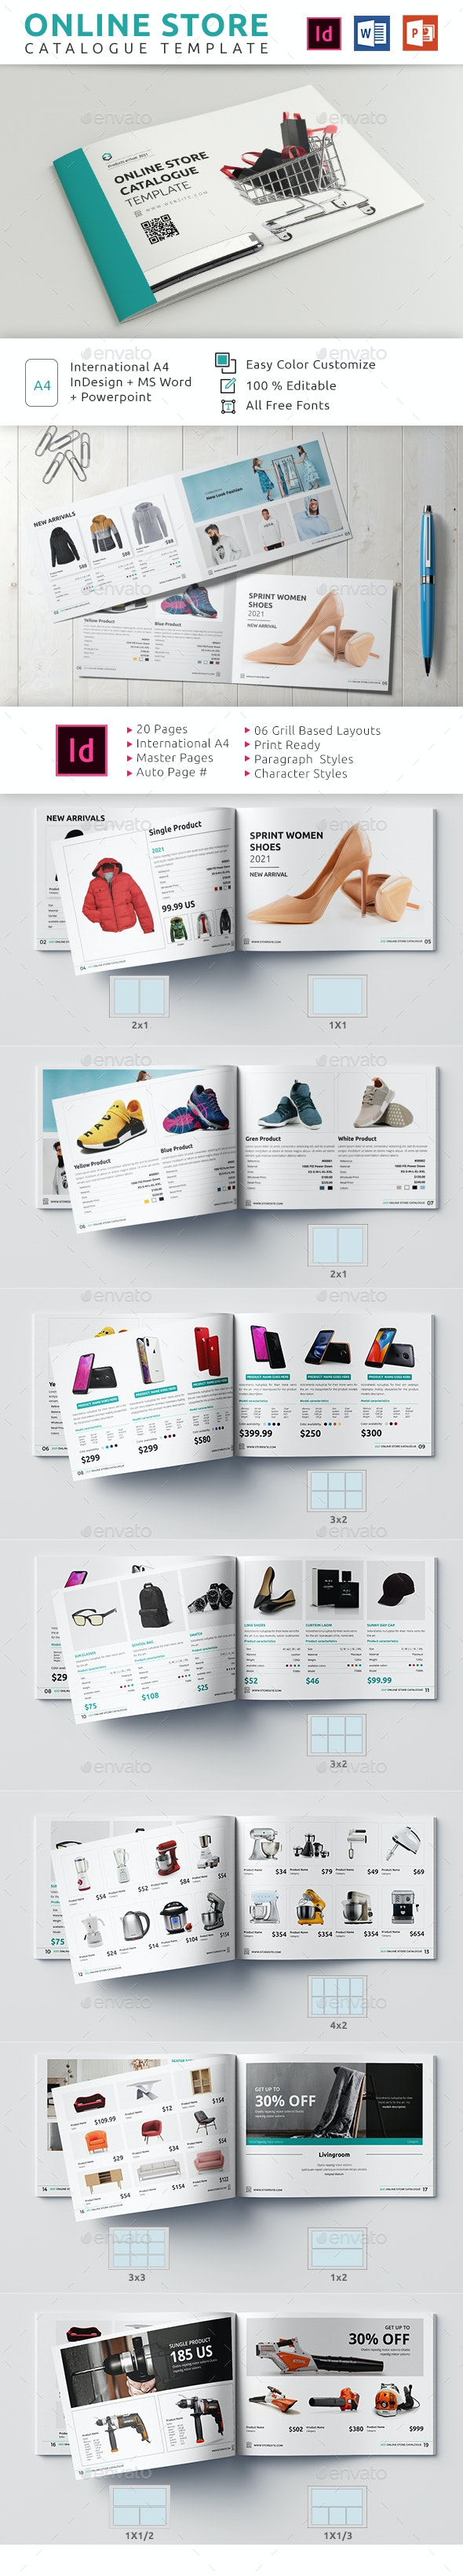 Online Store Catalogue Template - Catalogs Brochures